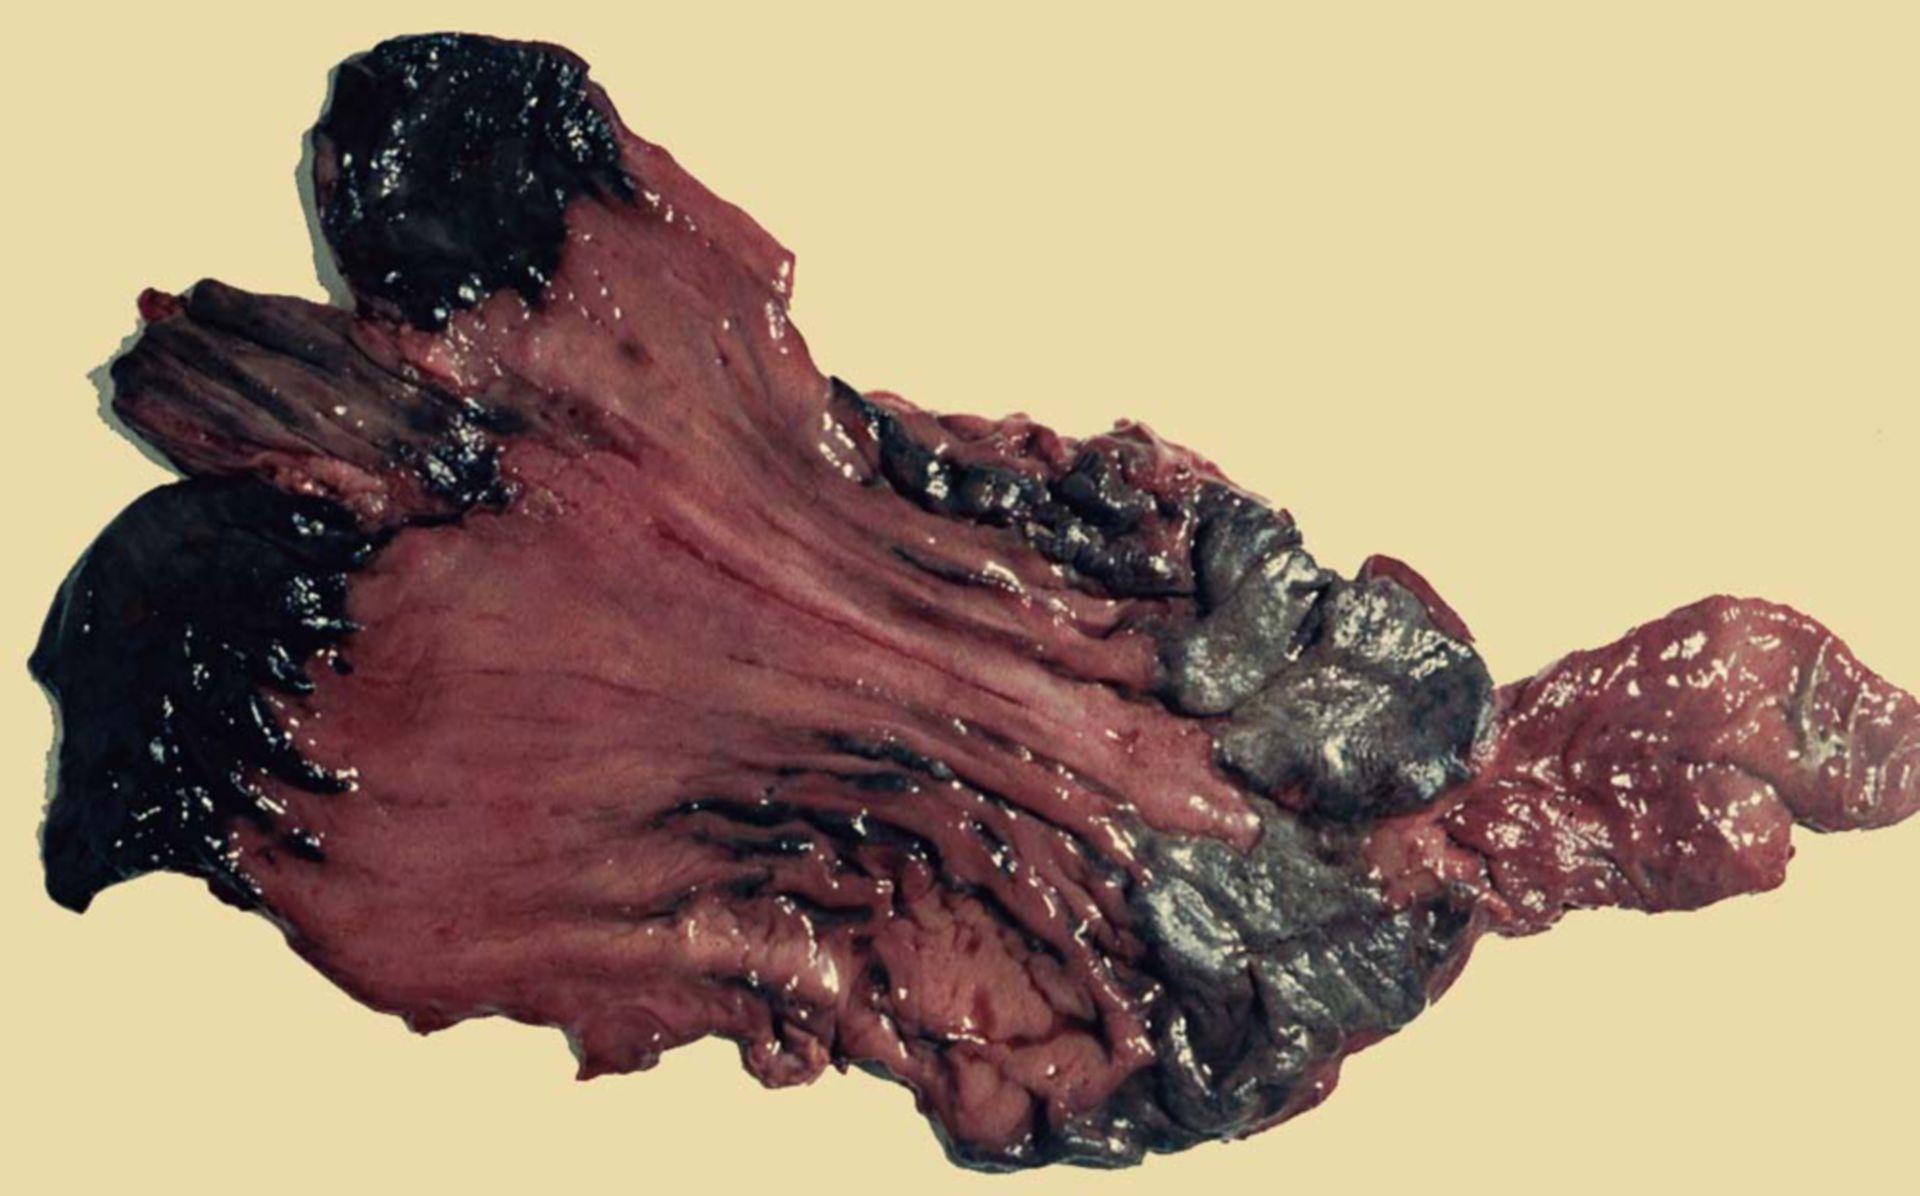 Corrosive injury by ammonium chloride (Suicide)